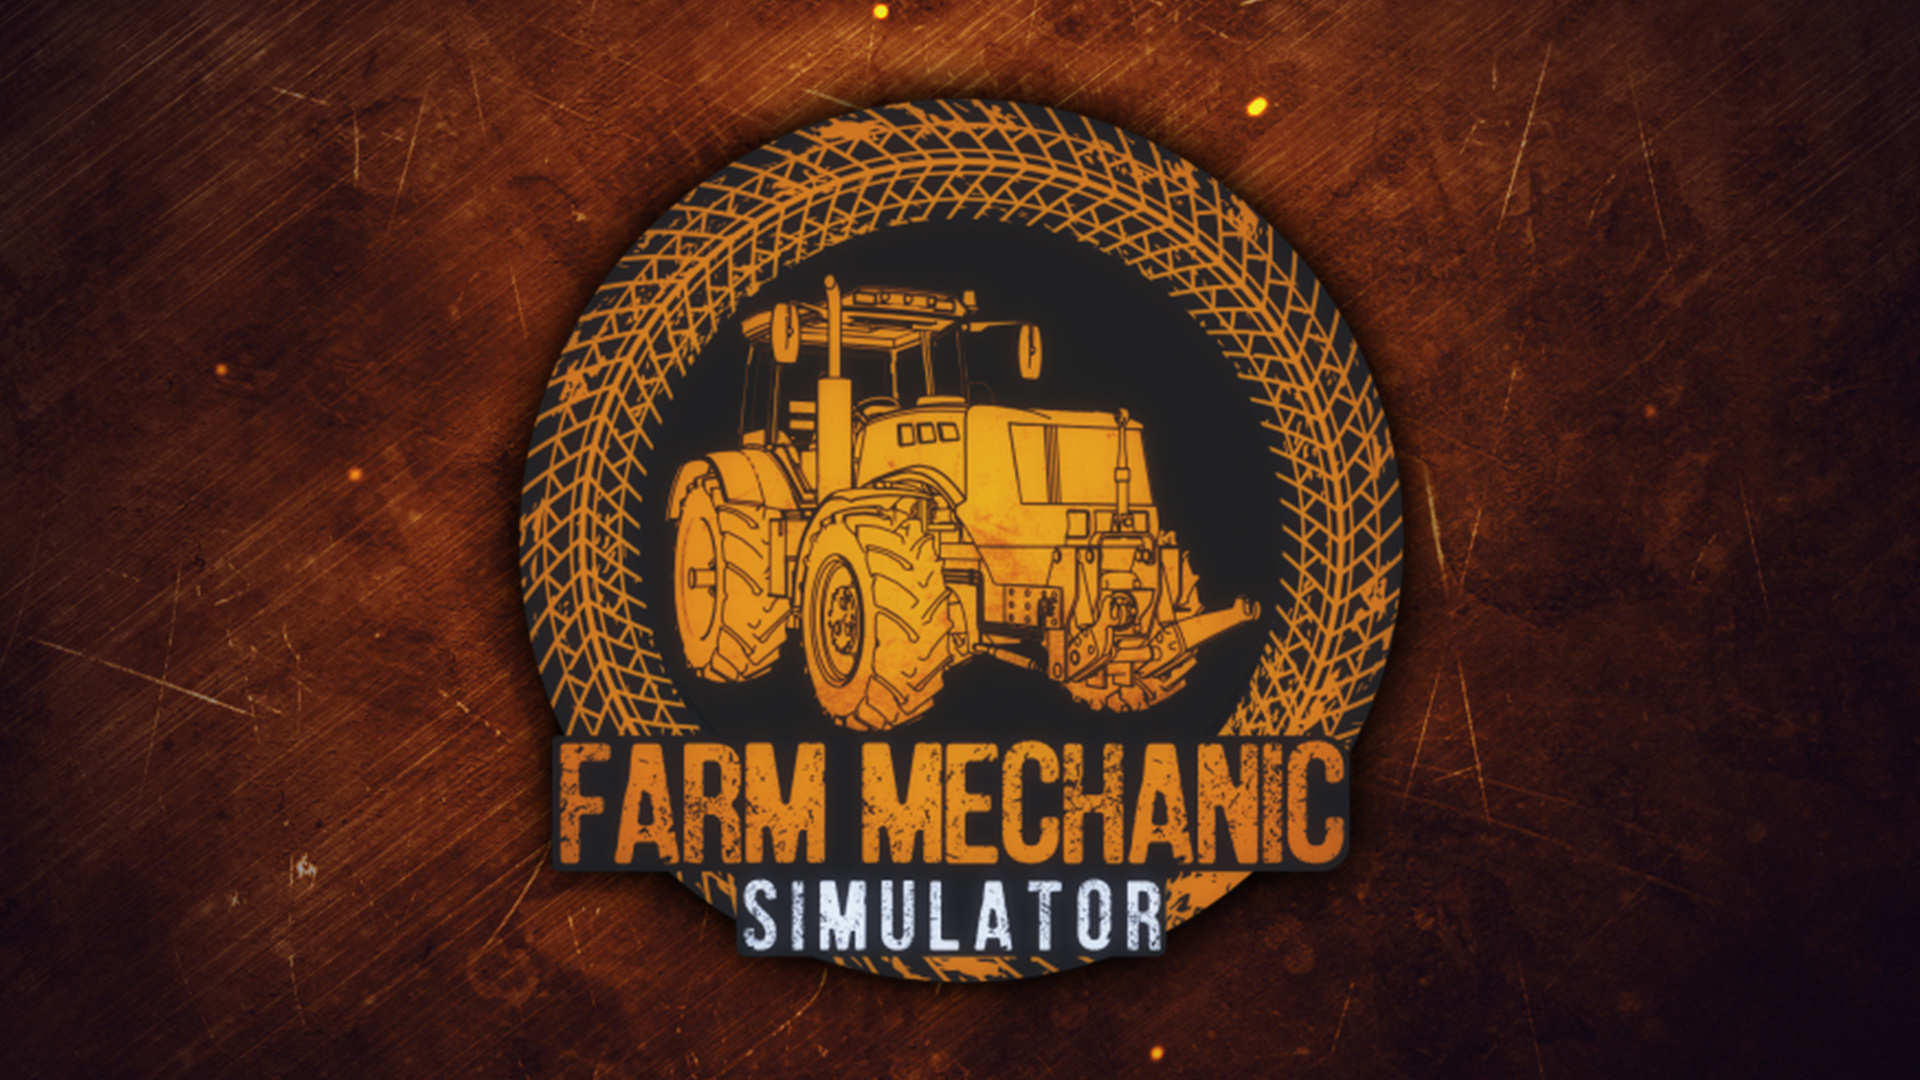 Farm Mechanic Simulator logo